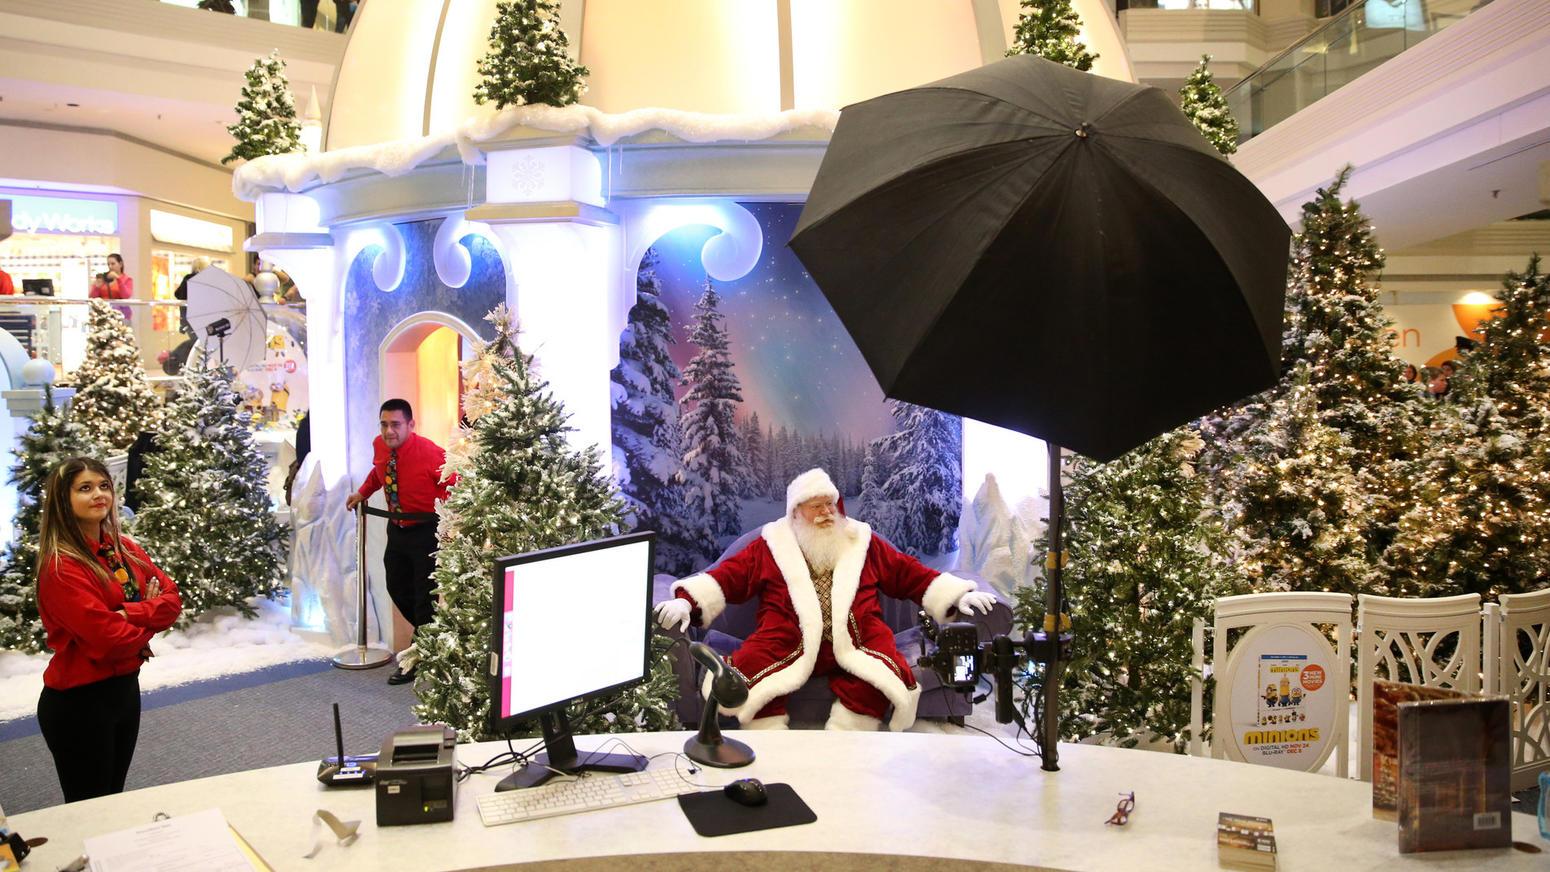 Marketing Santa at Woodfield Mall | The Quark In The Road